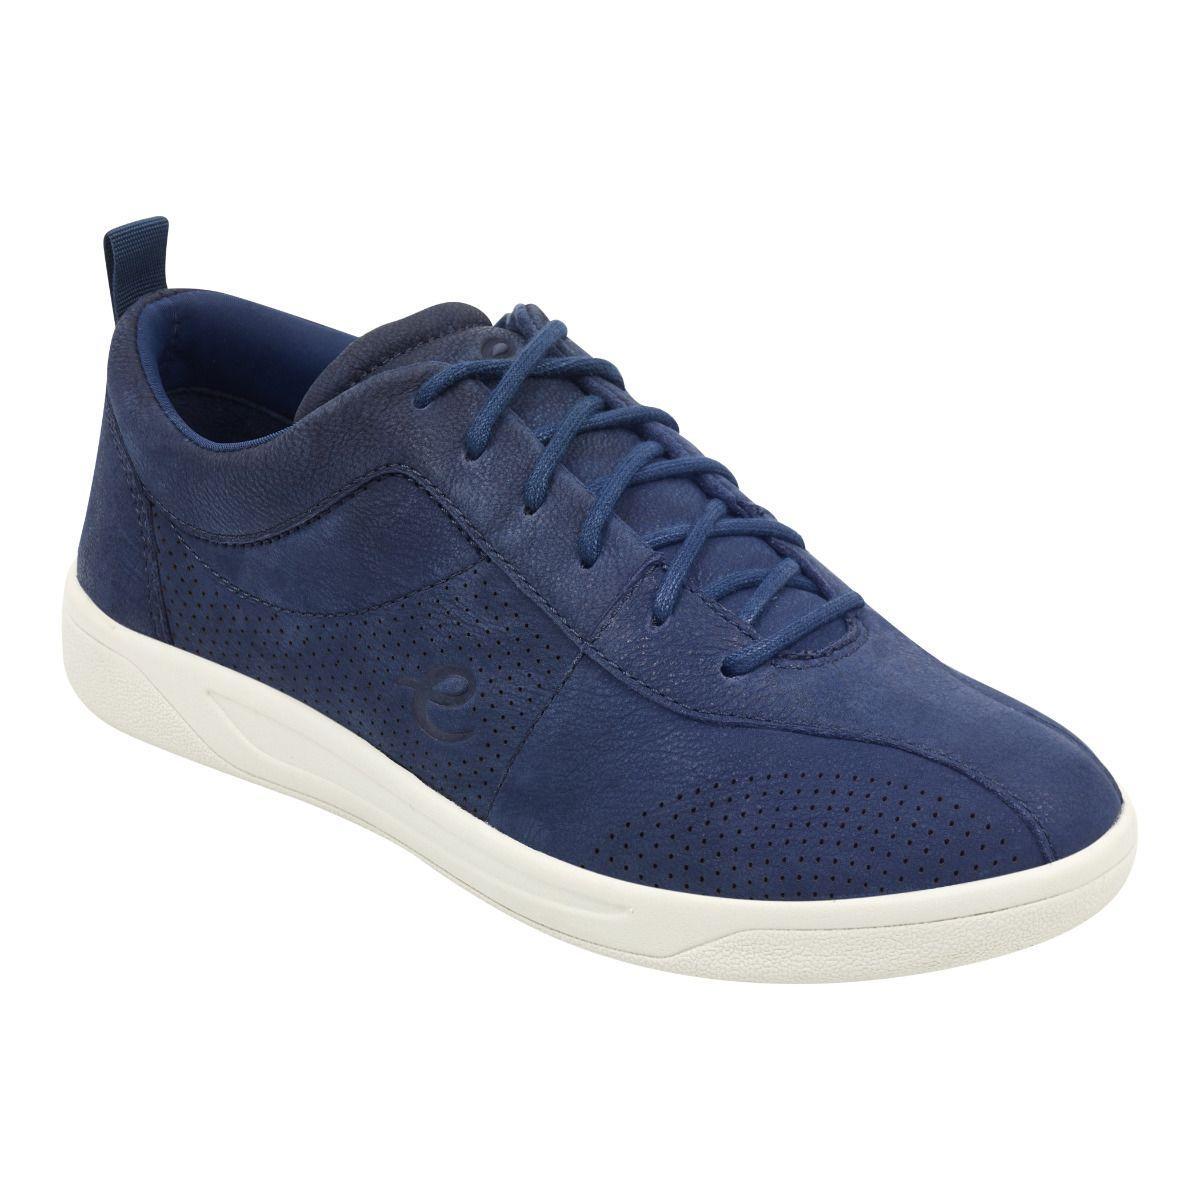 Freney Casual Walking Shoes - Lyst